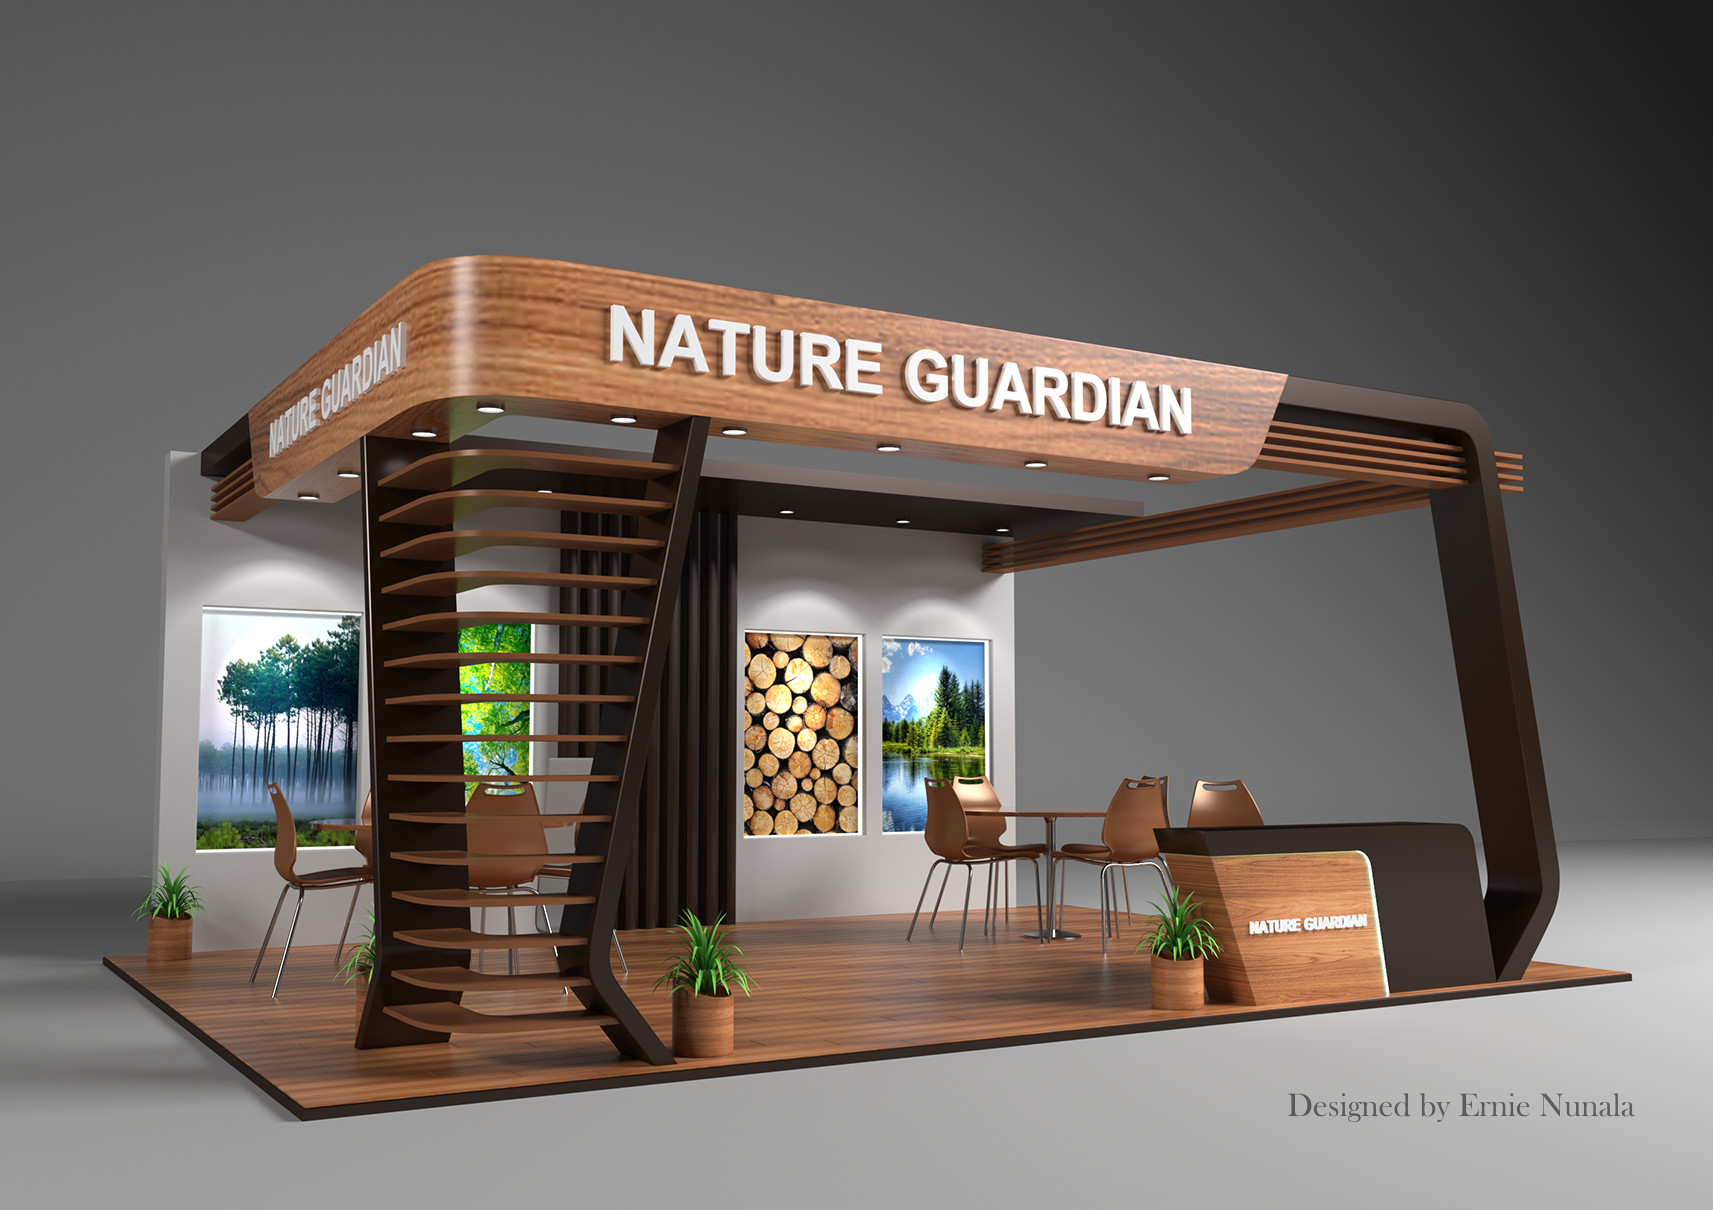 Exhibition Booth Design Concept : Artstation exhibition booth design ernie nunala